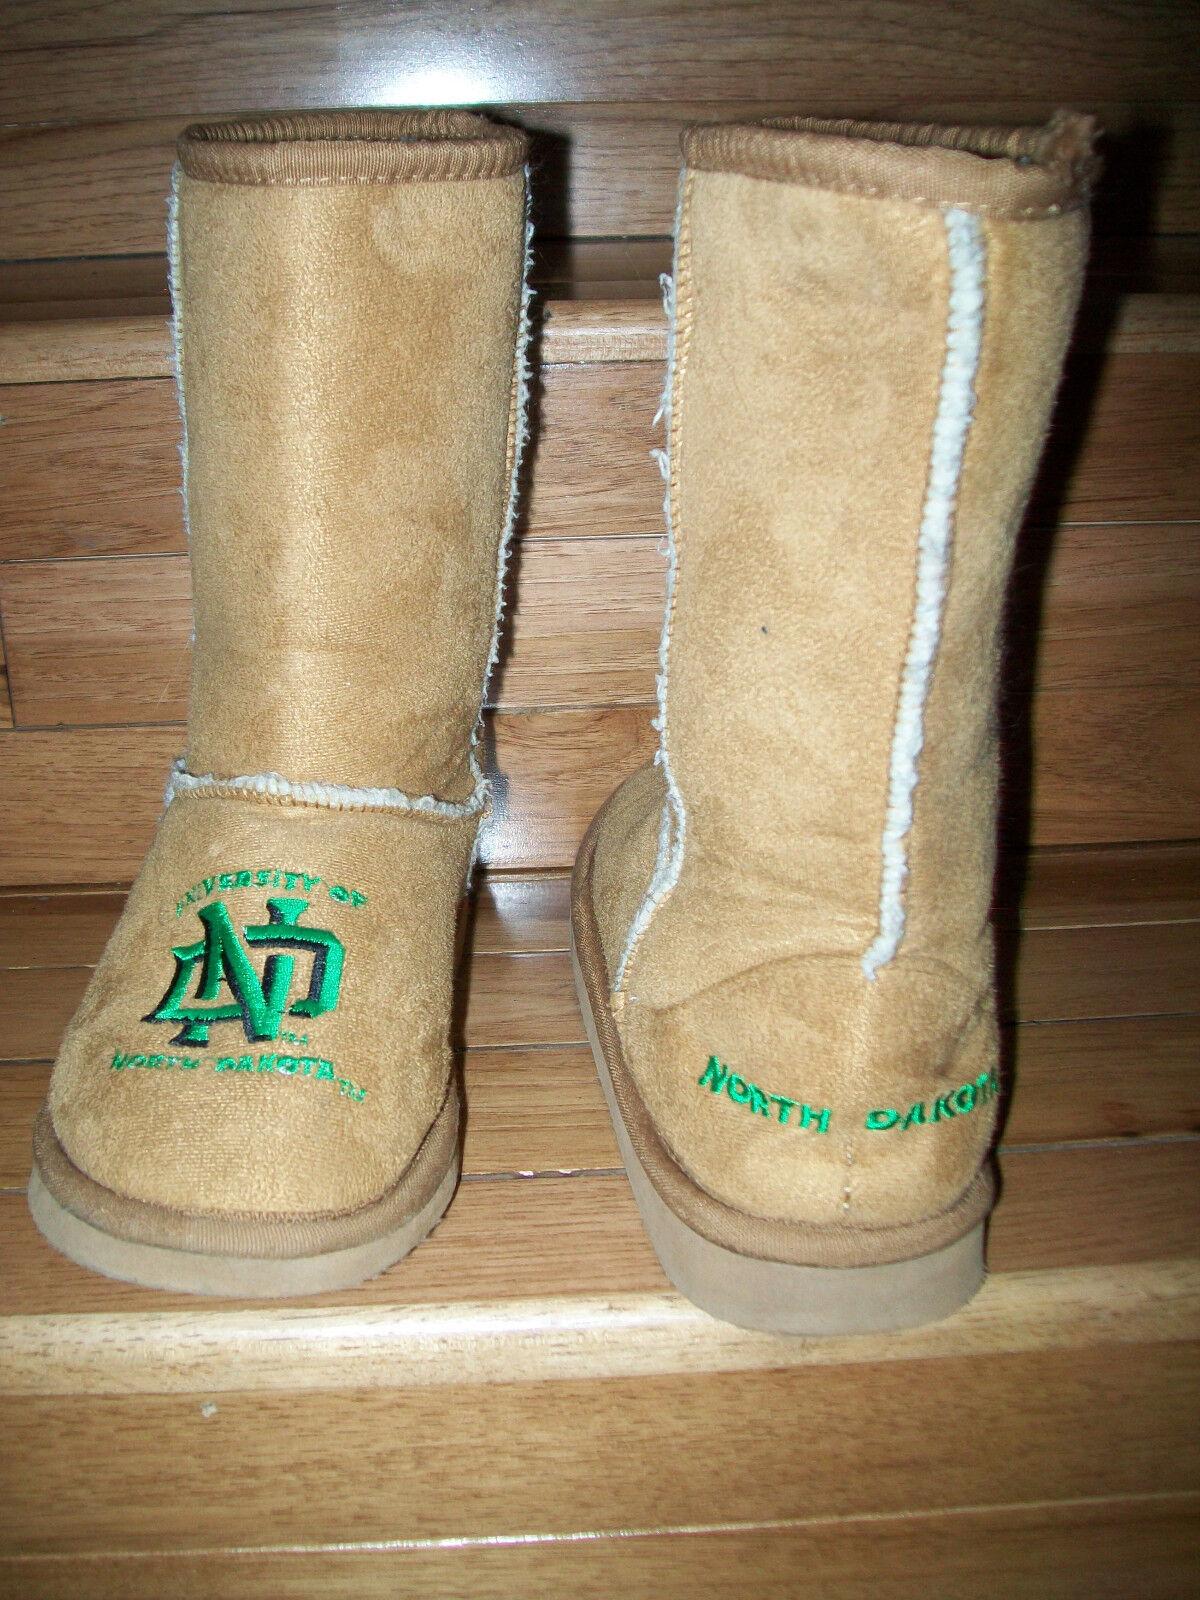 Womens Small 5-6 UND University of North Dakota Tall Slipper Boots-Faux Suede